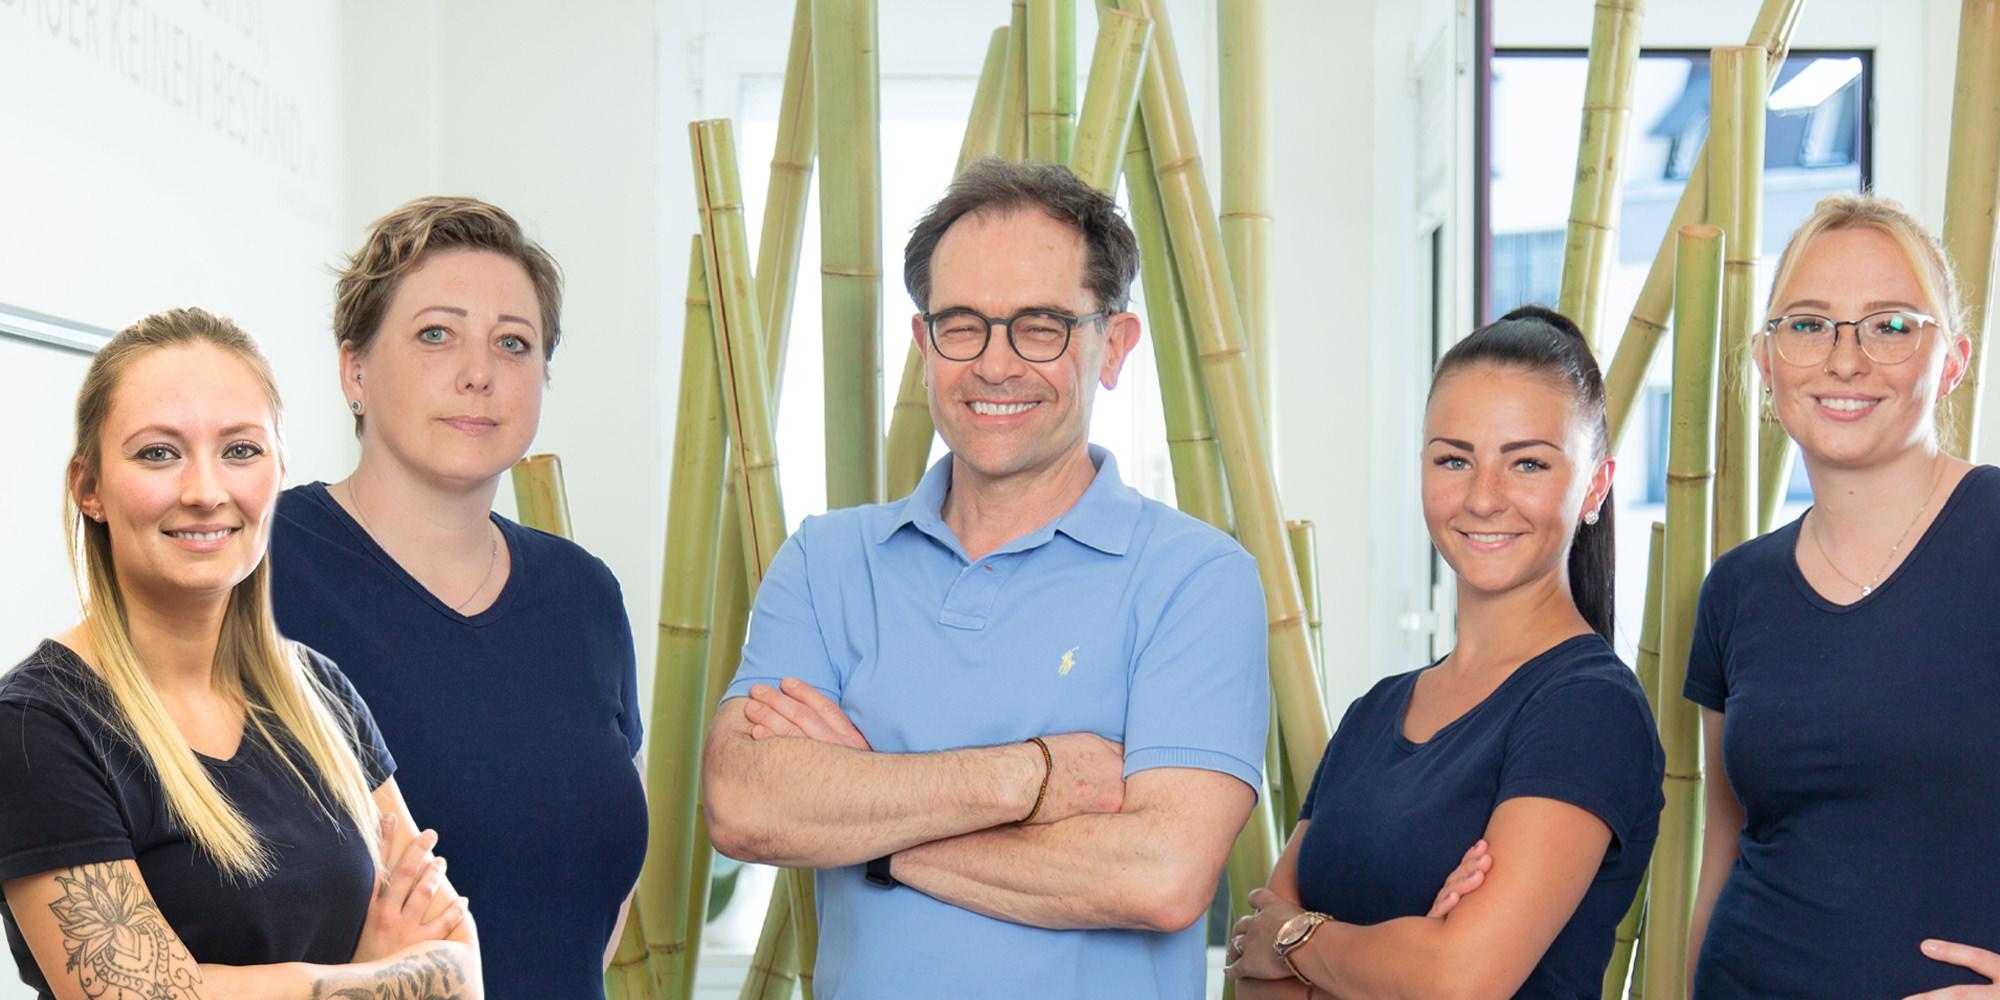 Orthopädie Stuttgart-Bad Cannstatt - Schulz - Team